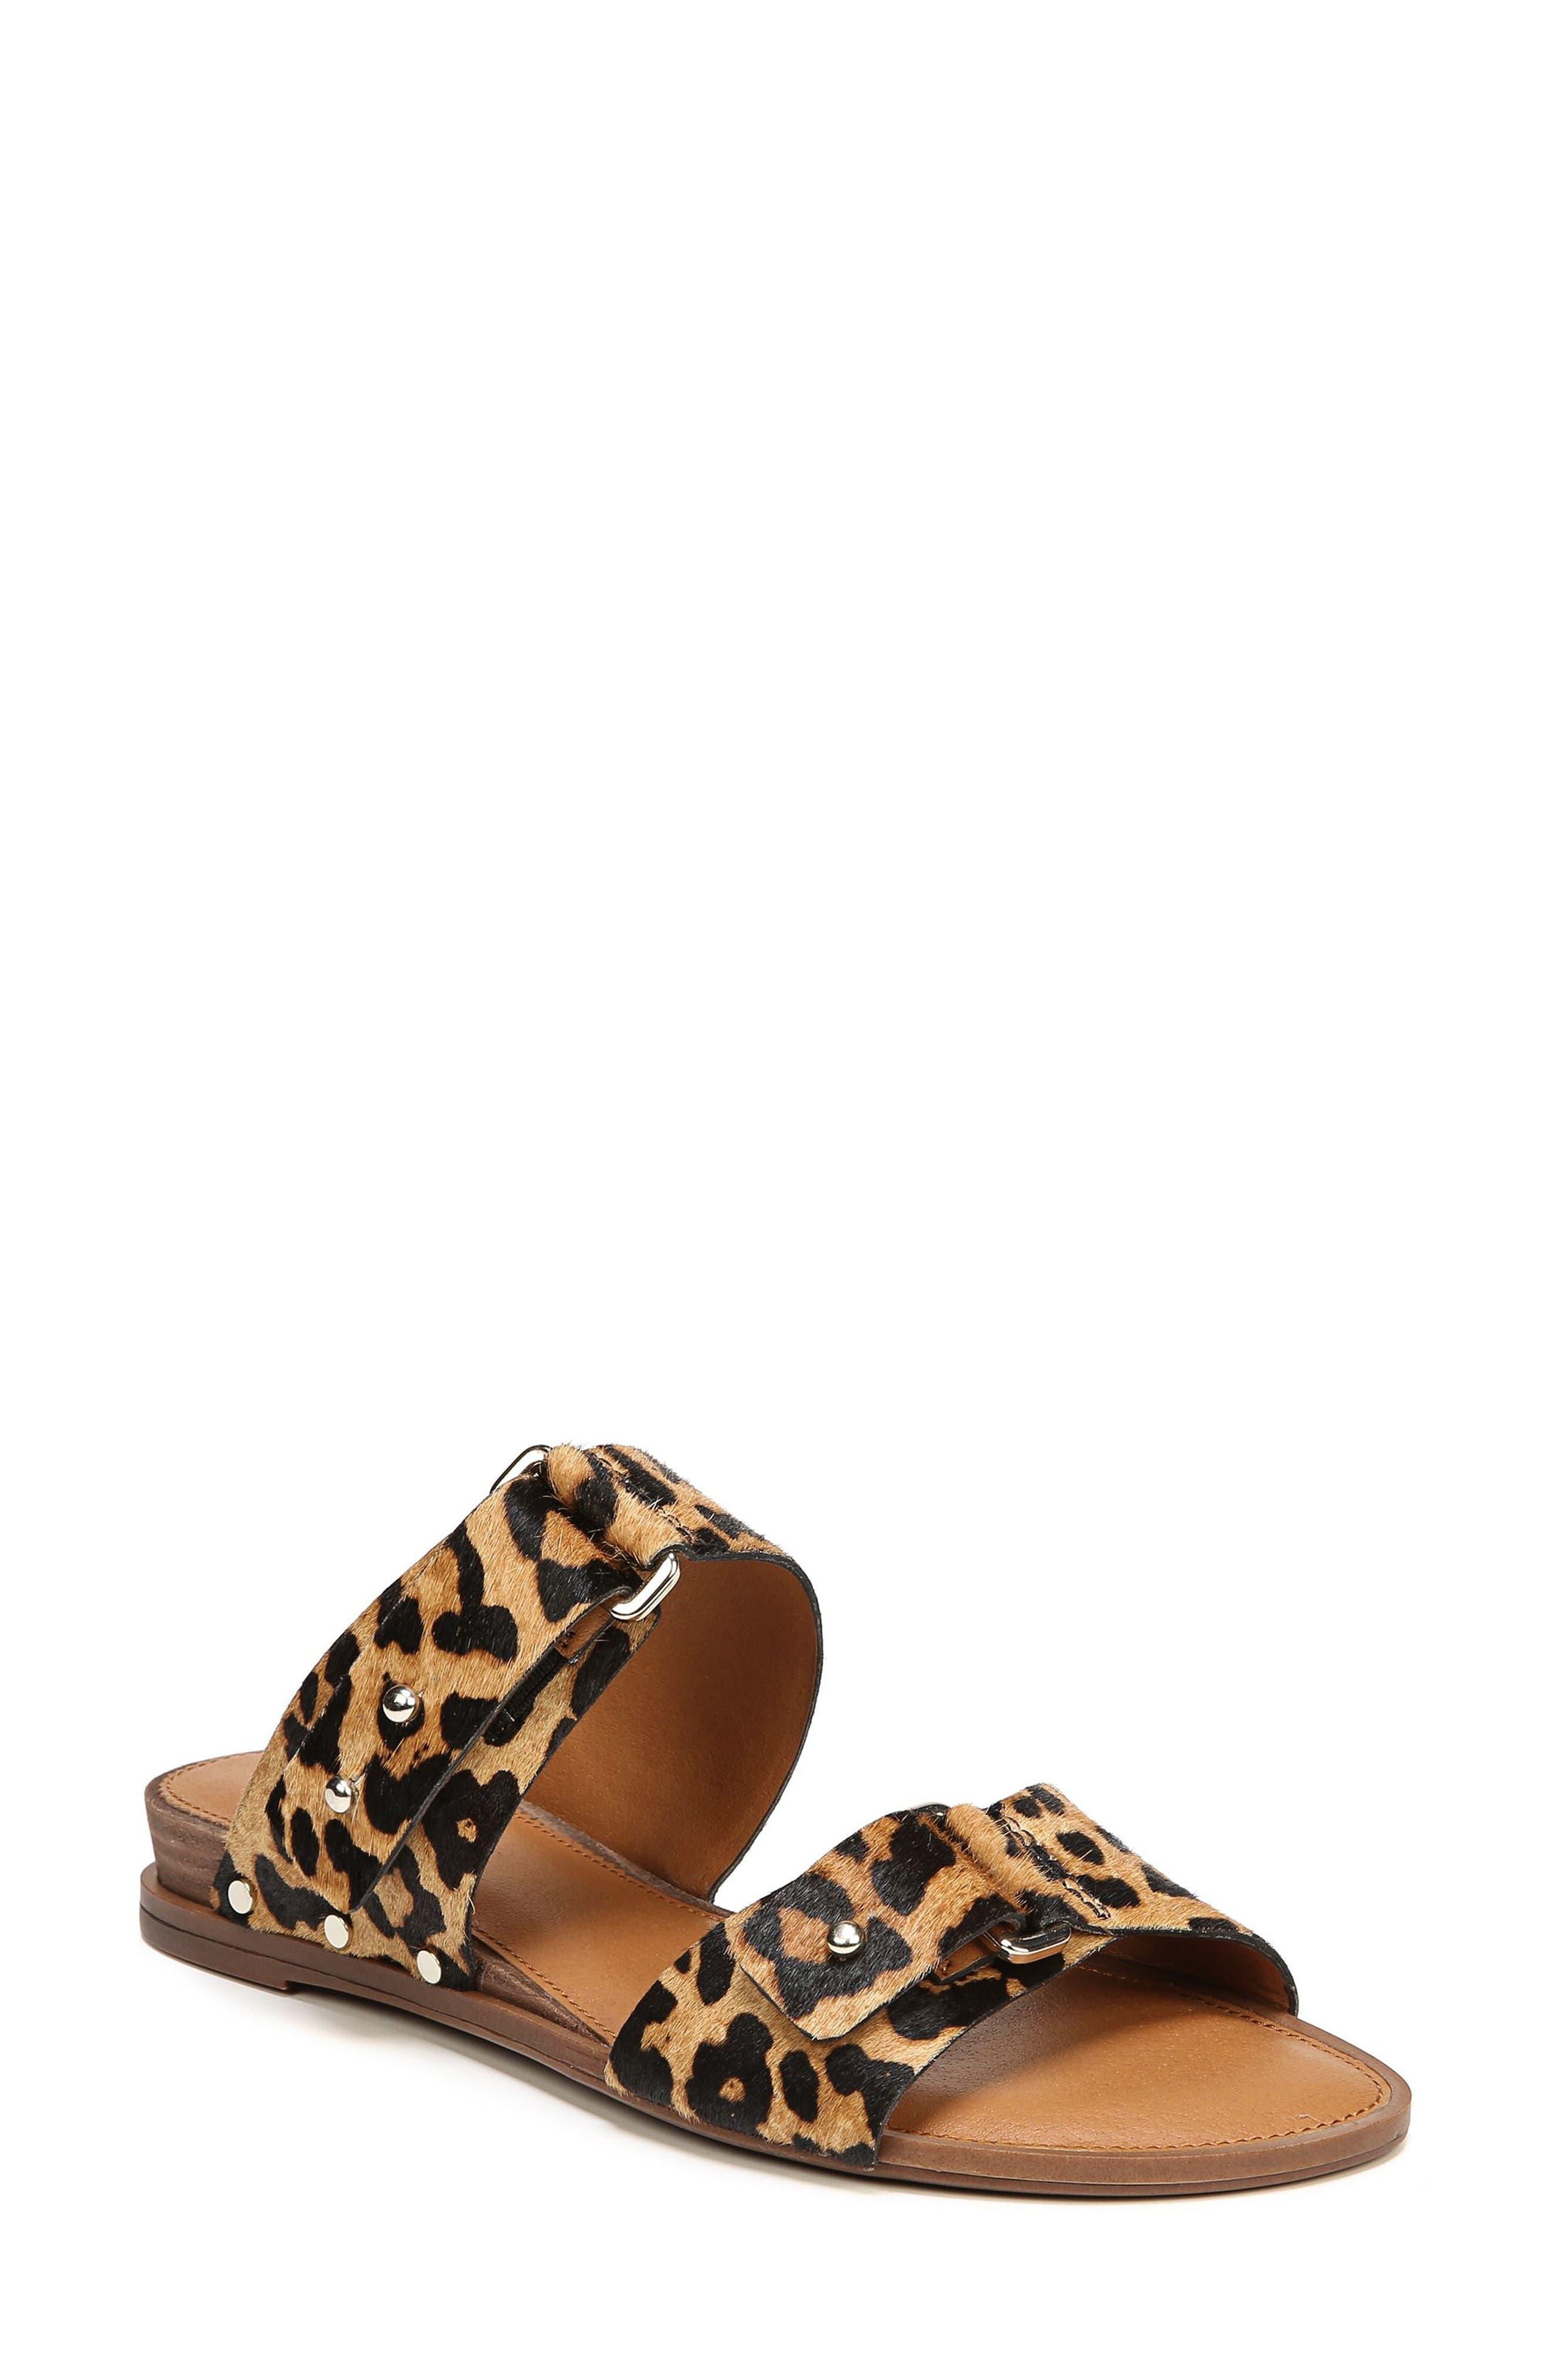 Palomino Genuine Calf Hair Sandal,                             Main thumbnail 3, color,